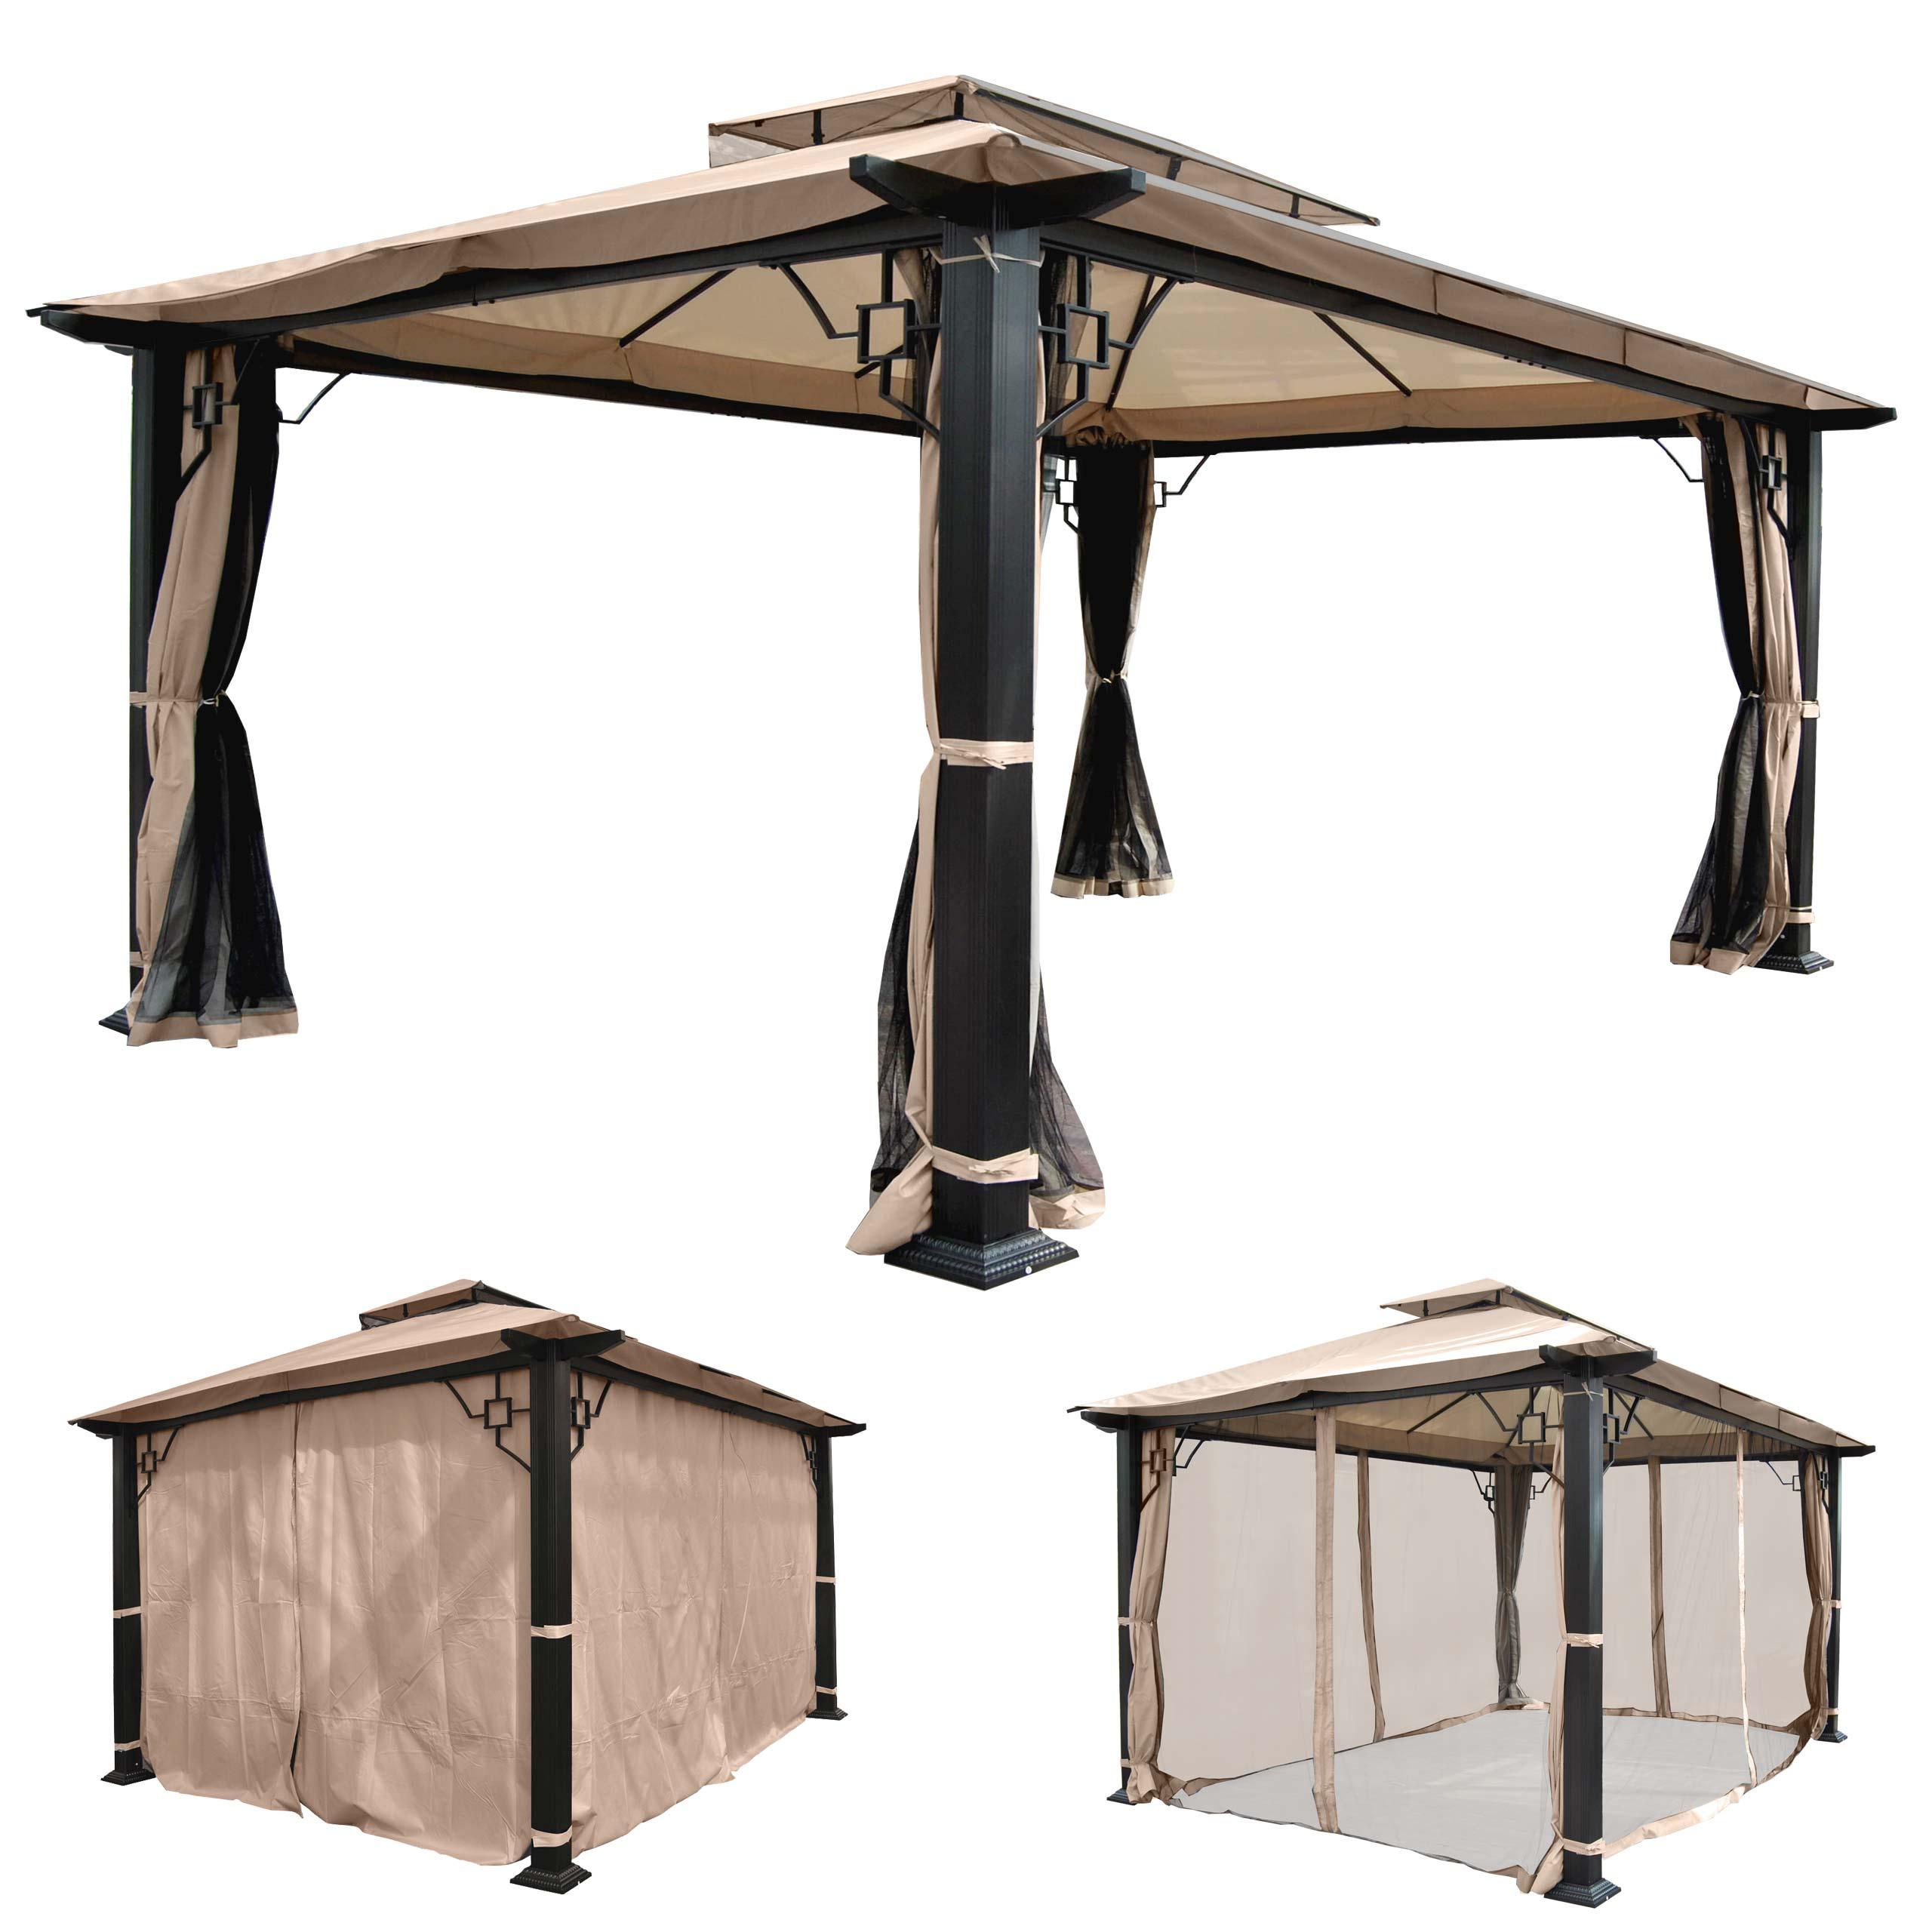 pergola nisa garten pavillon stabiles 12cm luxus alu. Black Bedroom Furniture Sets. Home Design Ideas